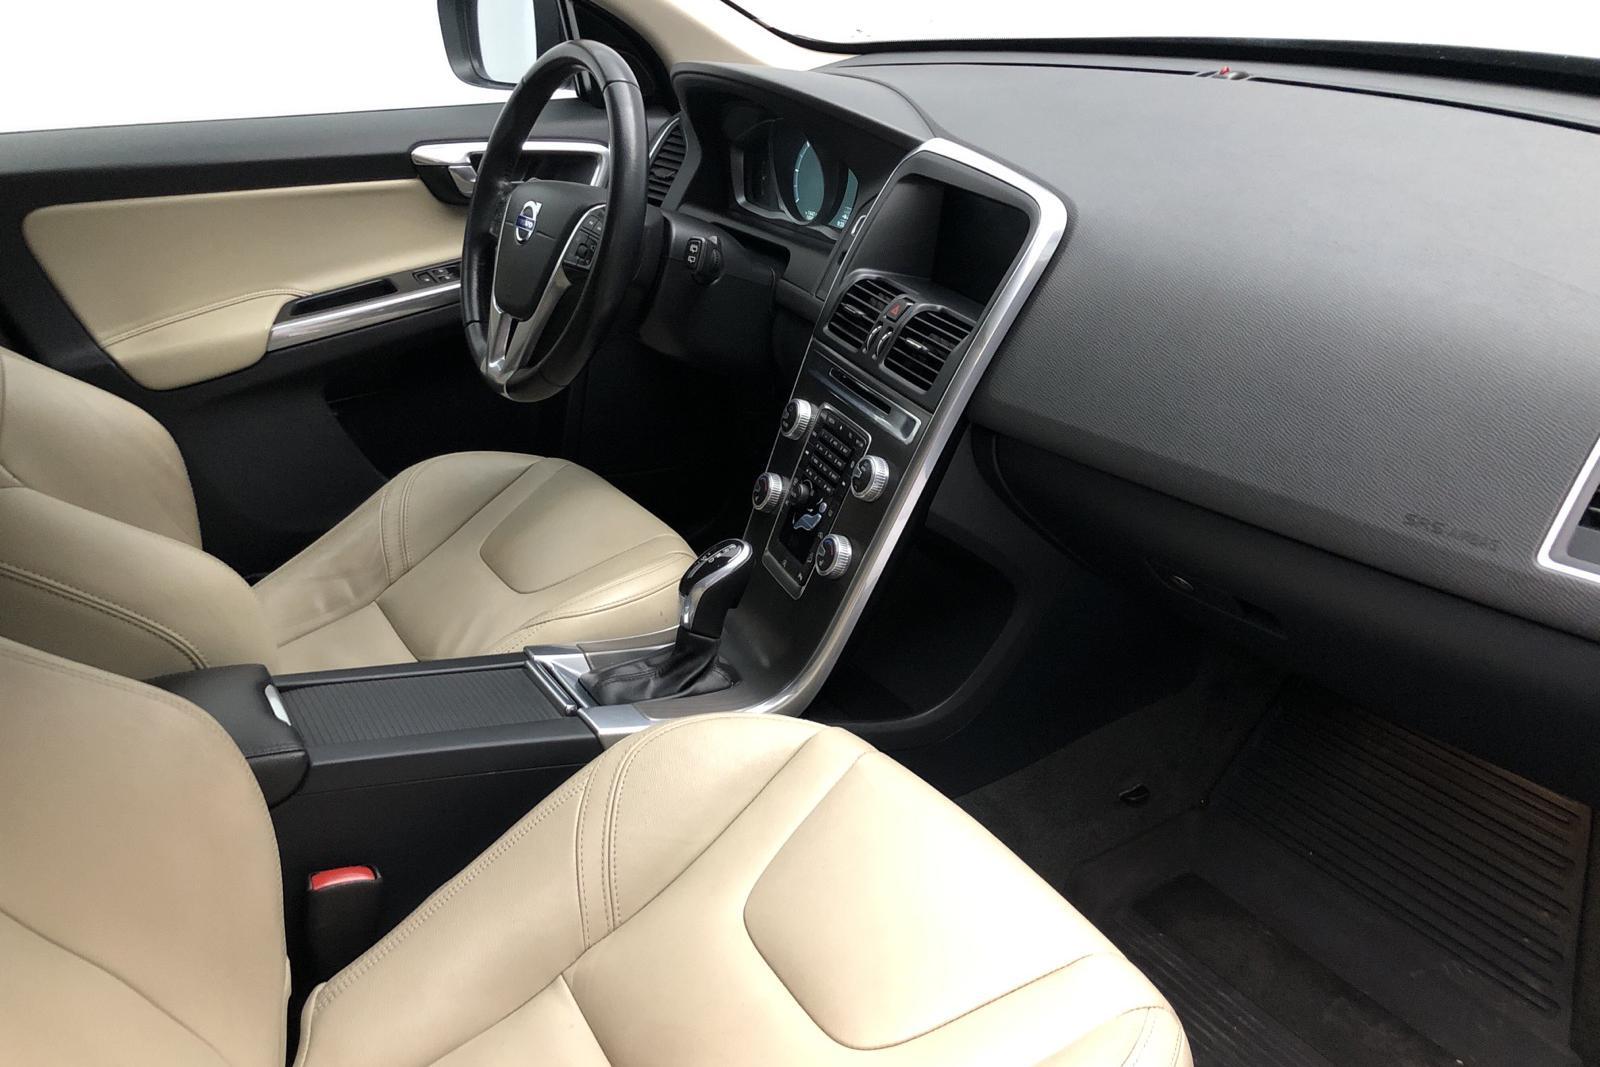 Volvo XC60 D4 AWD (190hk) - 16 986 mil - Automat - svart - 2016